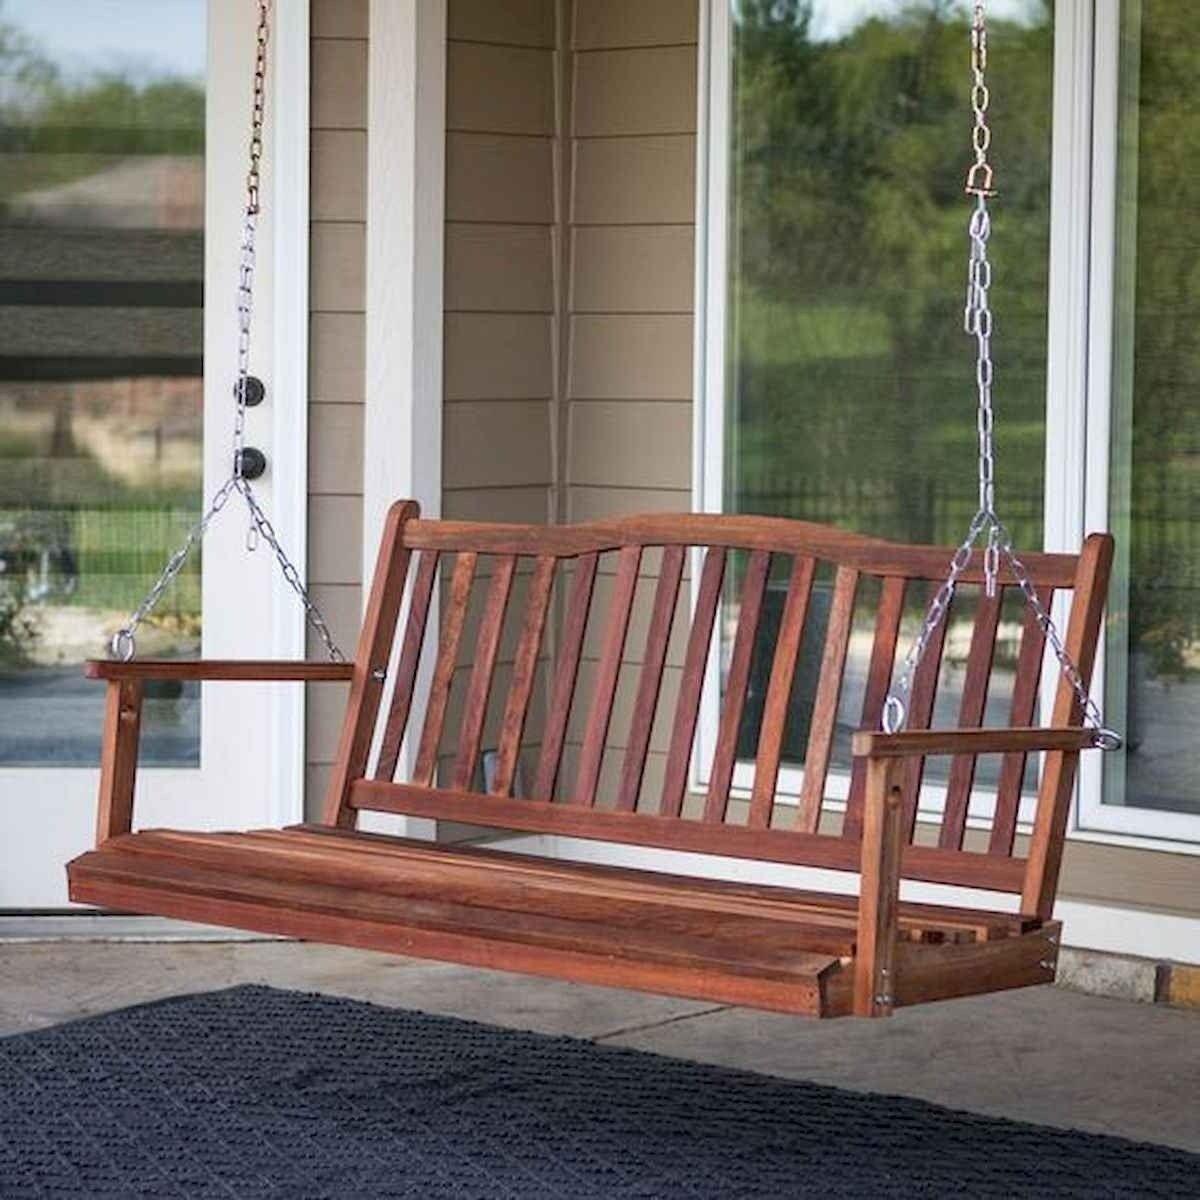 50 Amazing Diy Projects Pallet Swings Design Ideas Porch Swing Diy Porch Swing Plans Diy Porch Swing